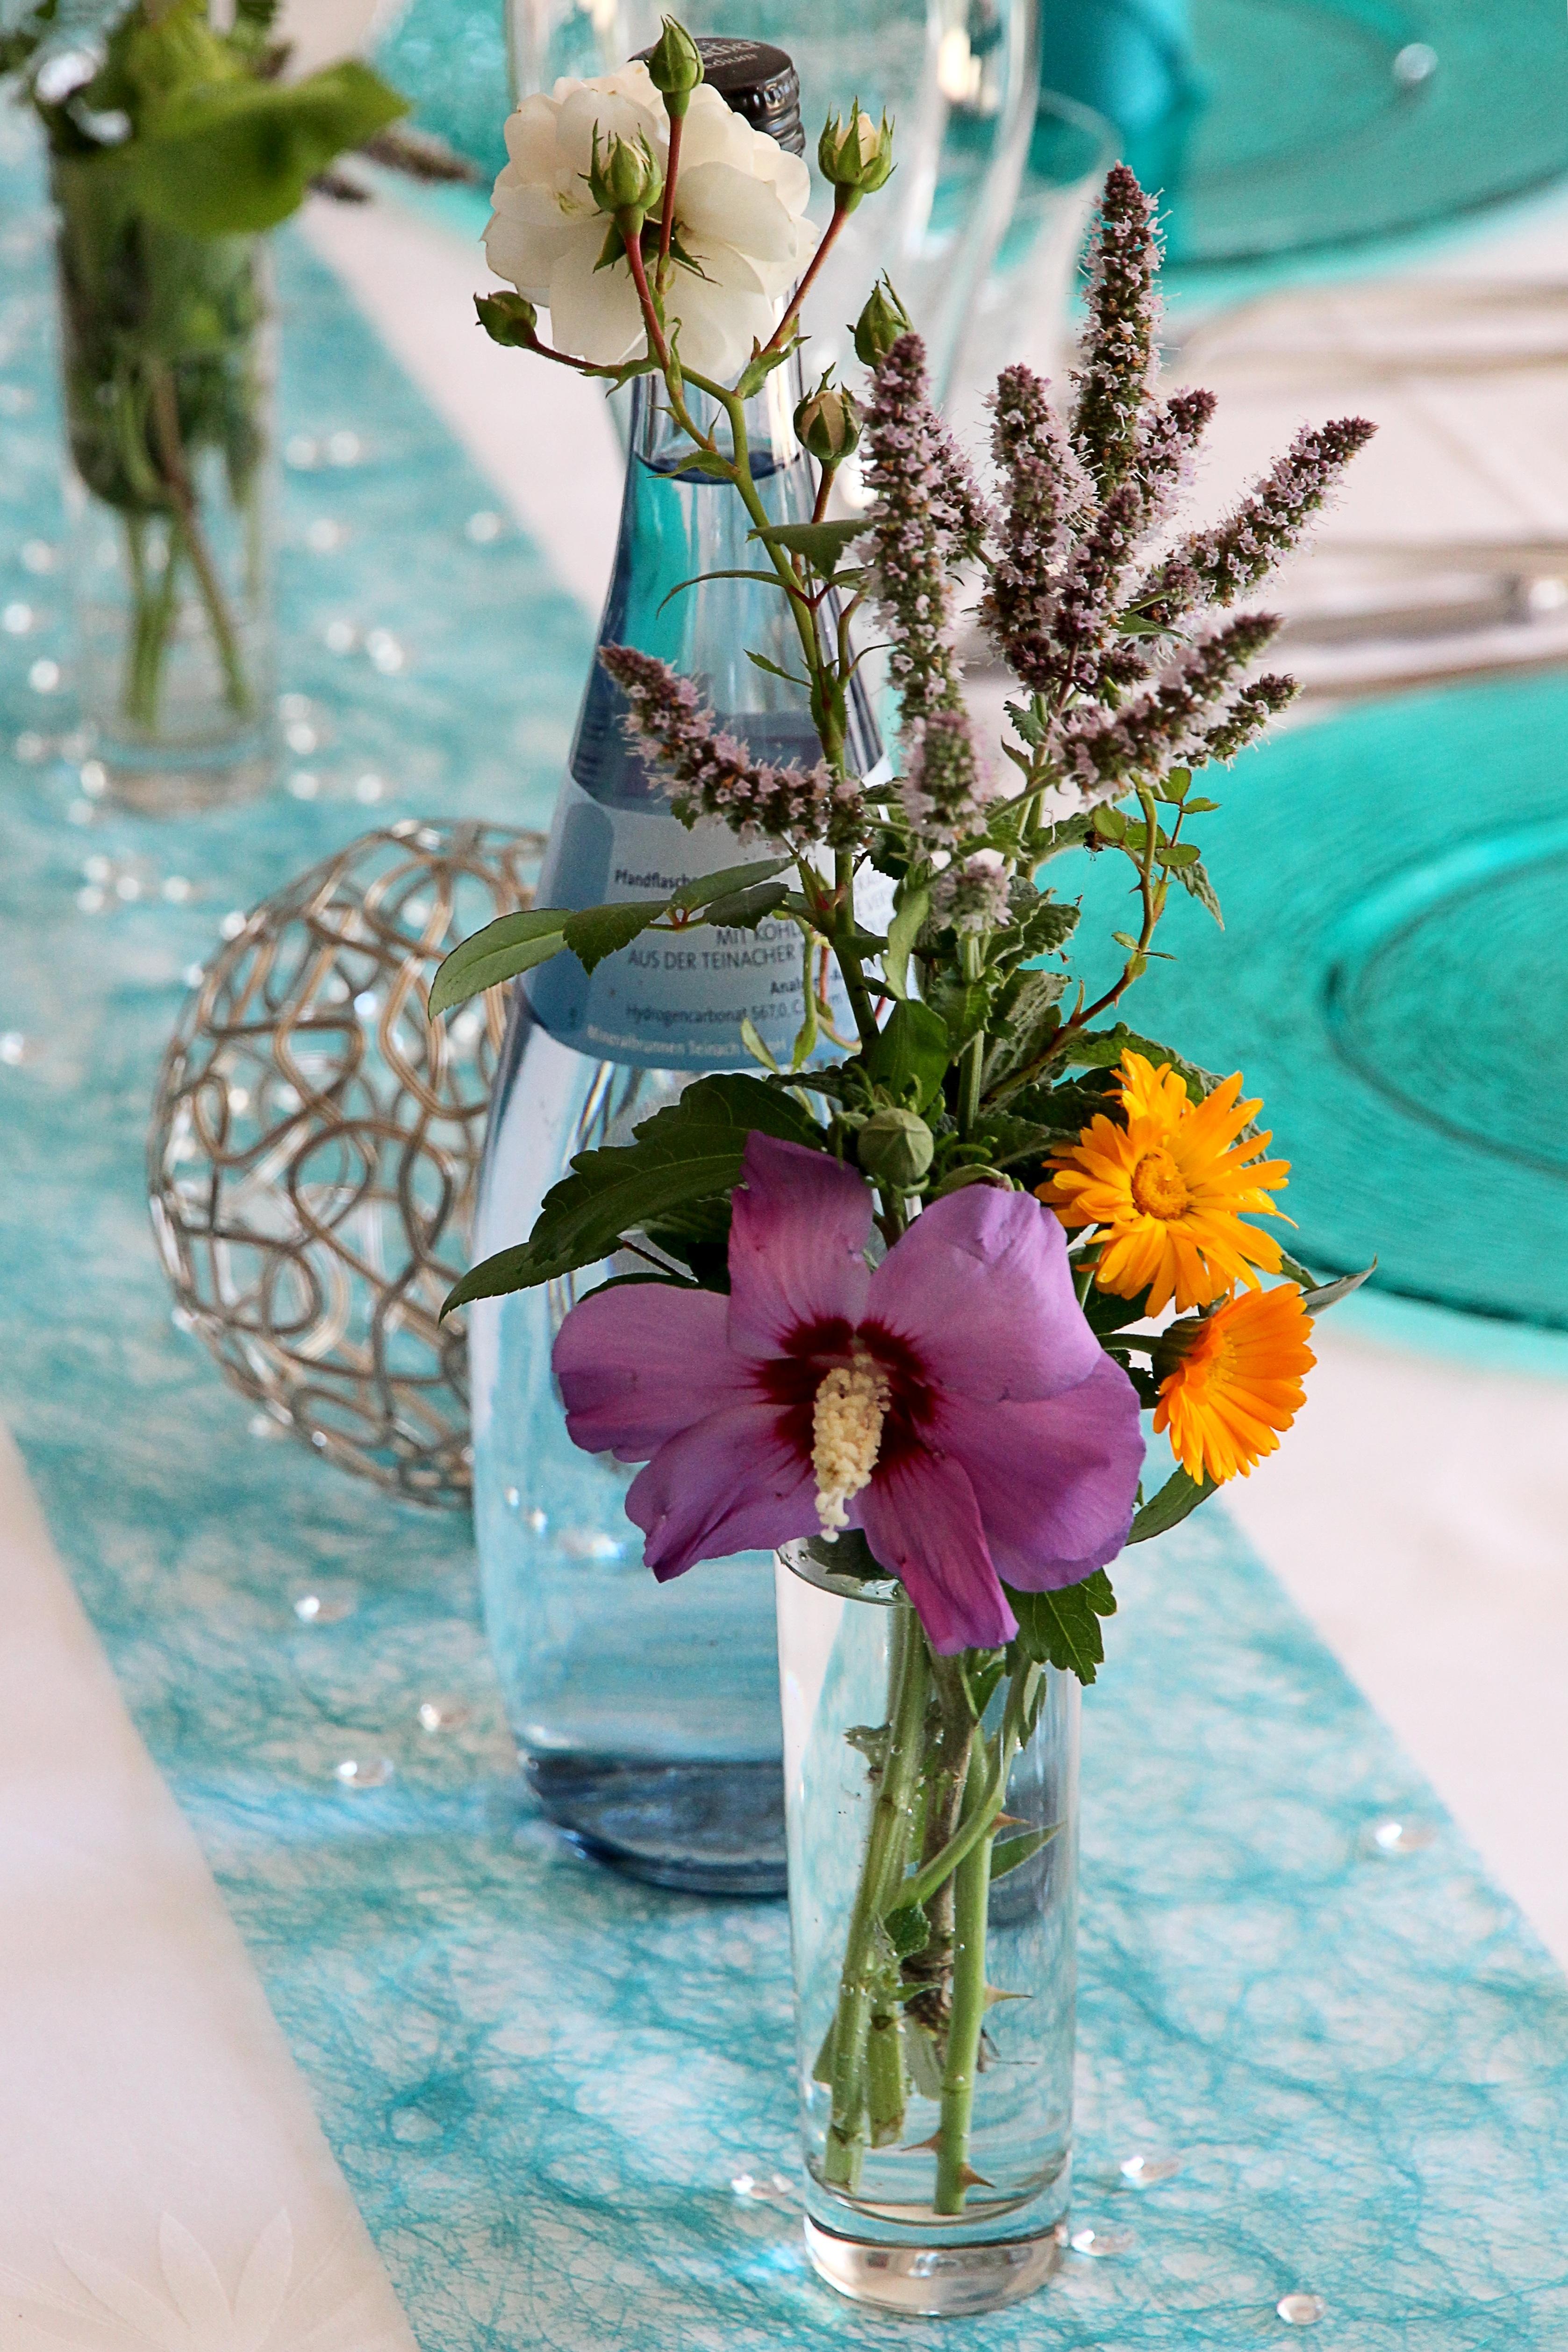 Free Images Blossom Bloom Restaurant Celebration Vase